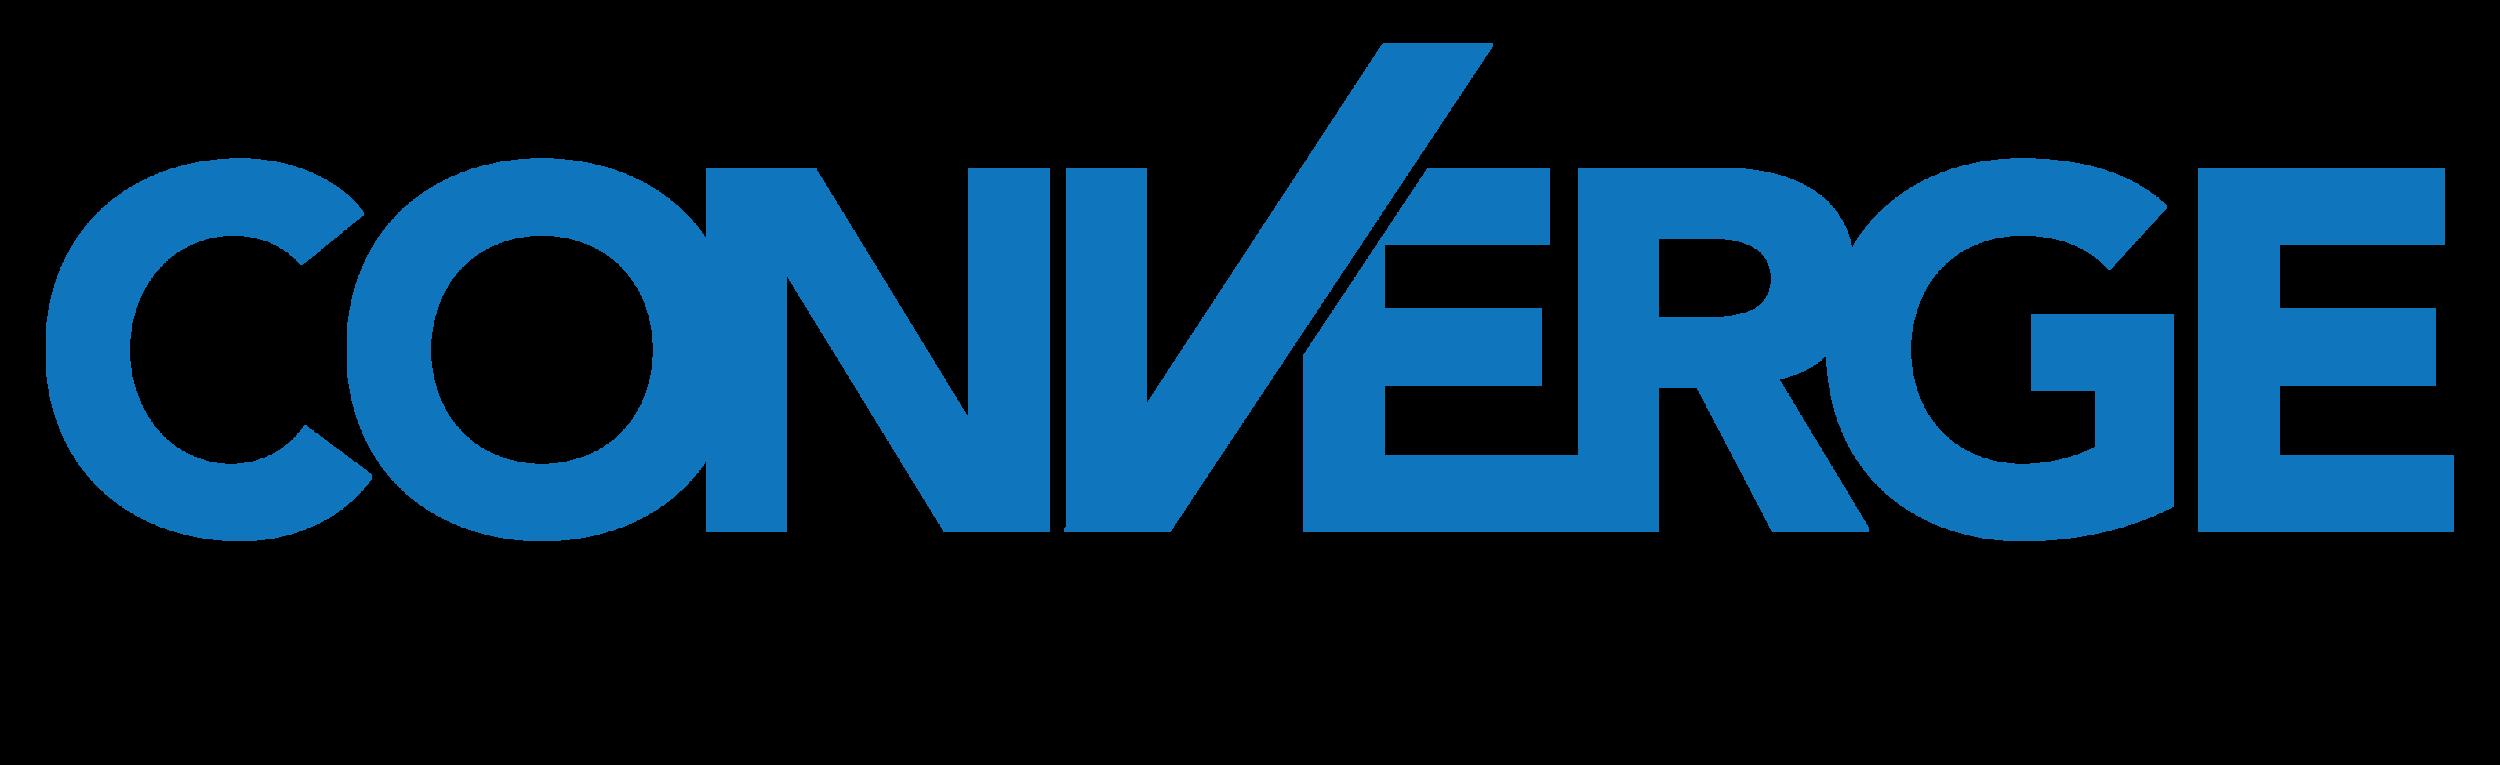 converge_2018_logo-01.png